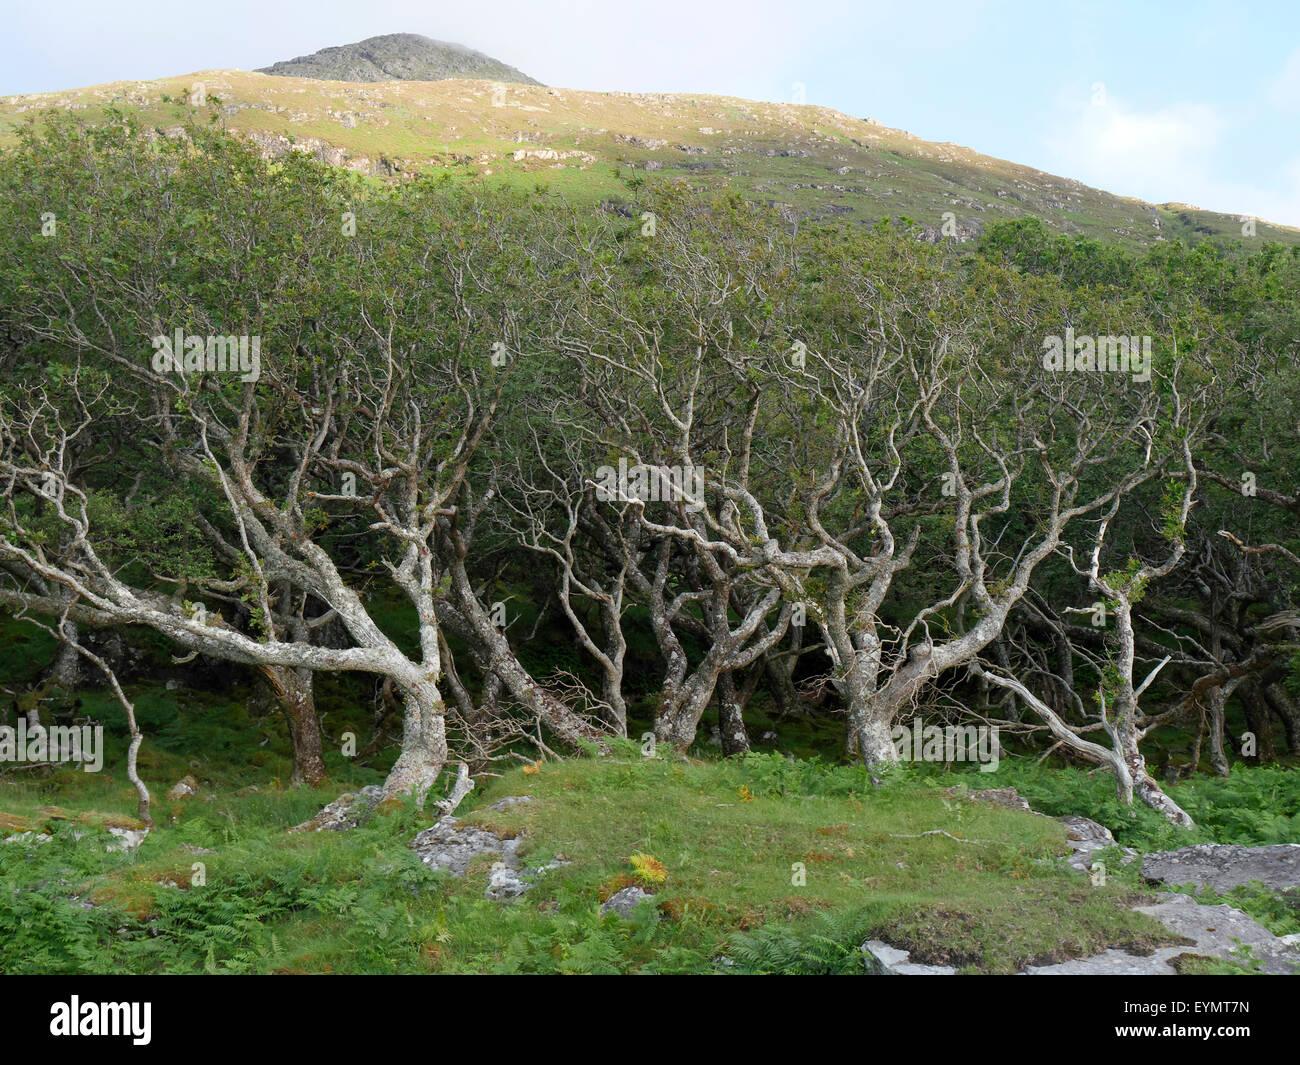 Oak woodland, bent by wind, Isle of Mull, Scotland, July 2014 - Stock Image